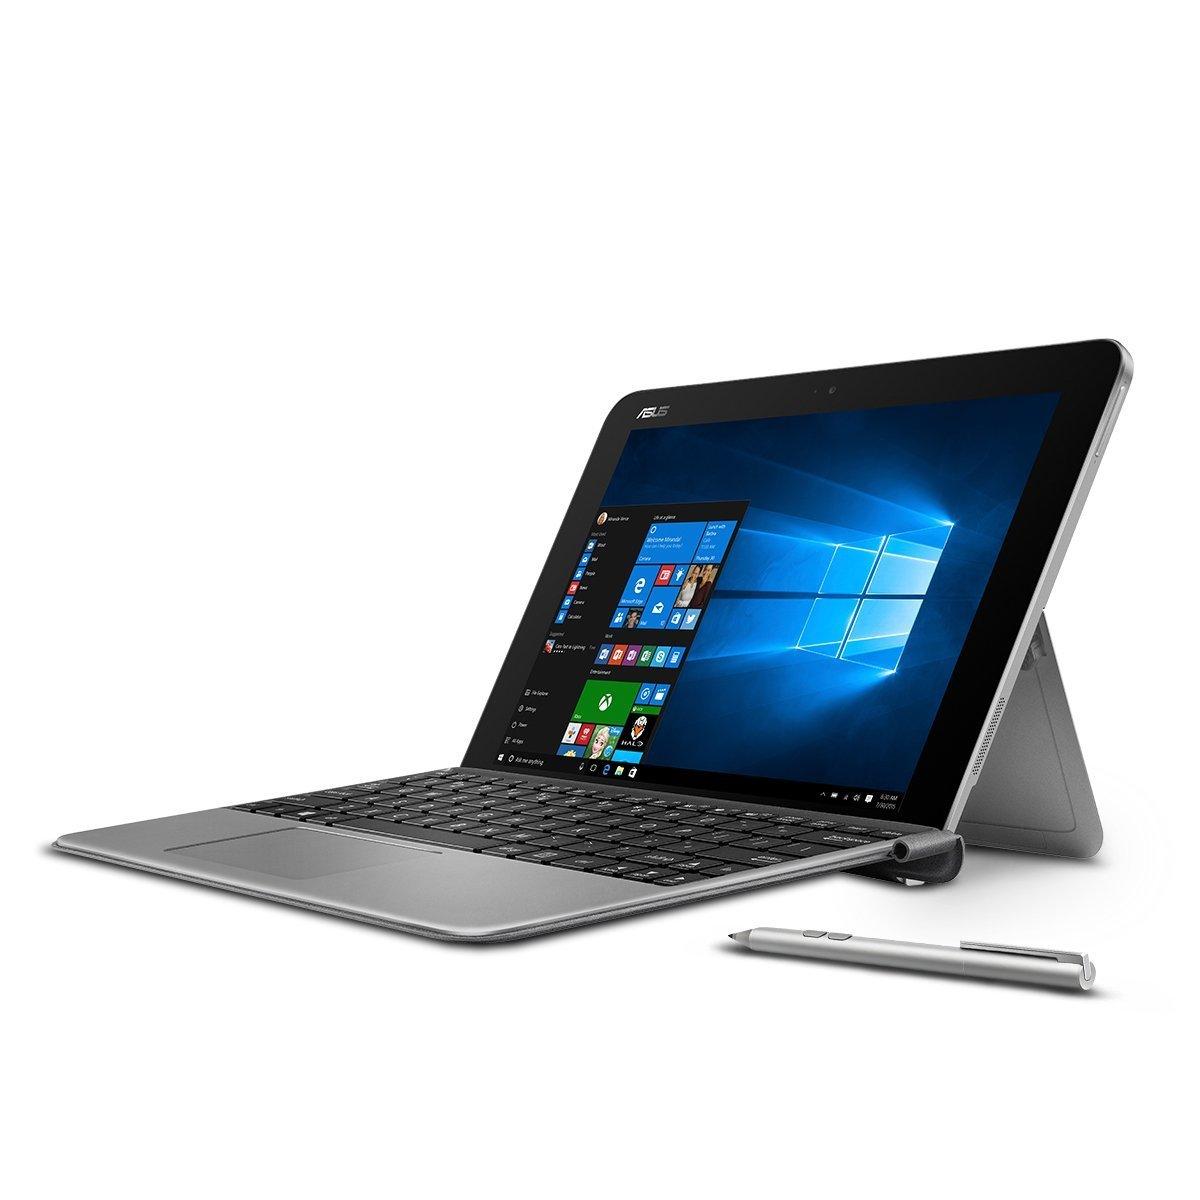 Premium ASUS Transformer 10.1'' Touchscreen 2-in-1 Laptop PC with Keyboard and Stylus Pen Intel Atom x5-Z8350 Processor 4GB RAM 64GB SSD 802.11AC Wifi HDMI Bluetooth Webcam Windows 10-Gray